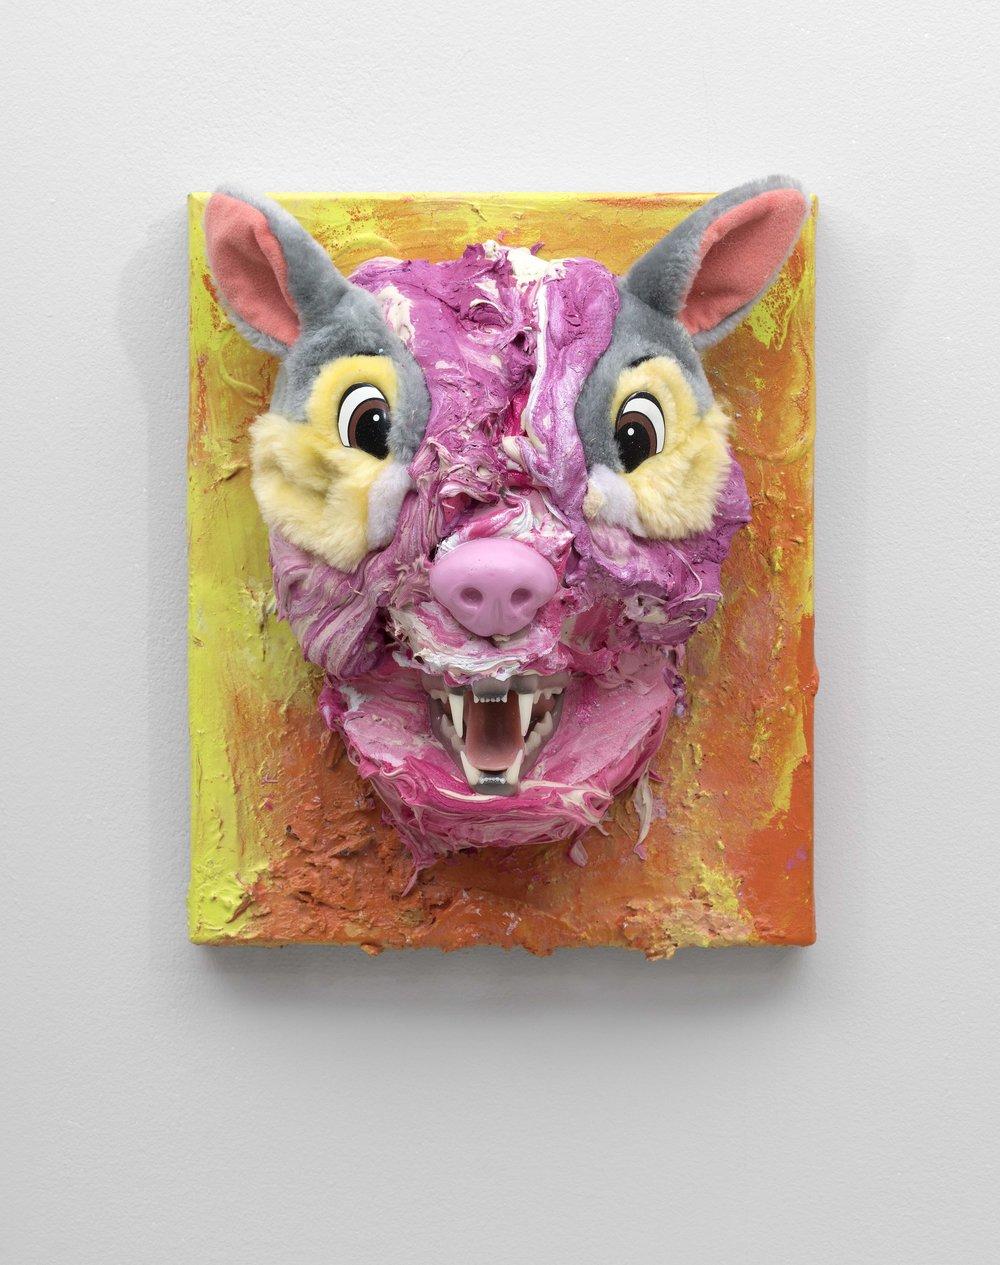 Thumper on Steroids, 30.5 x 26 x 16 cm, 2019.